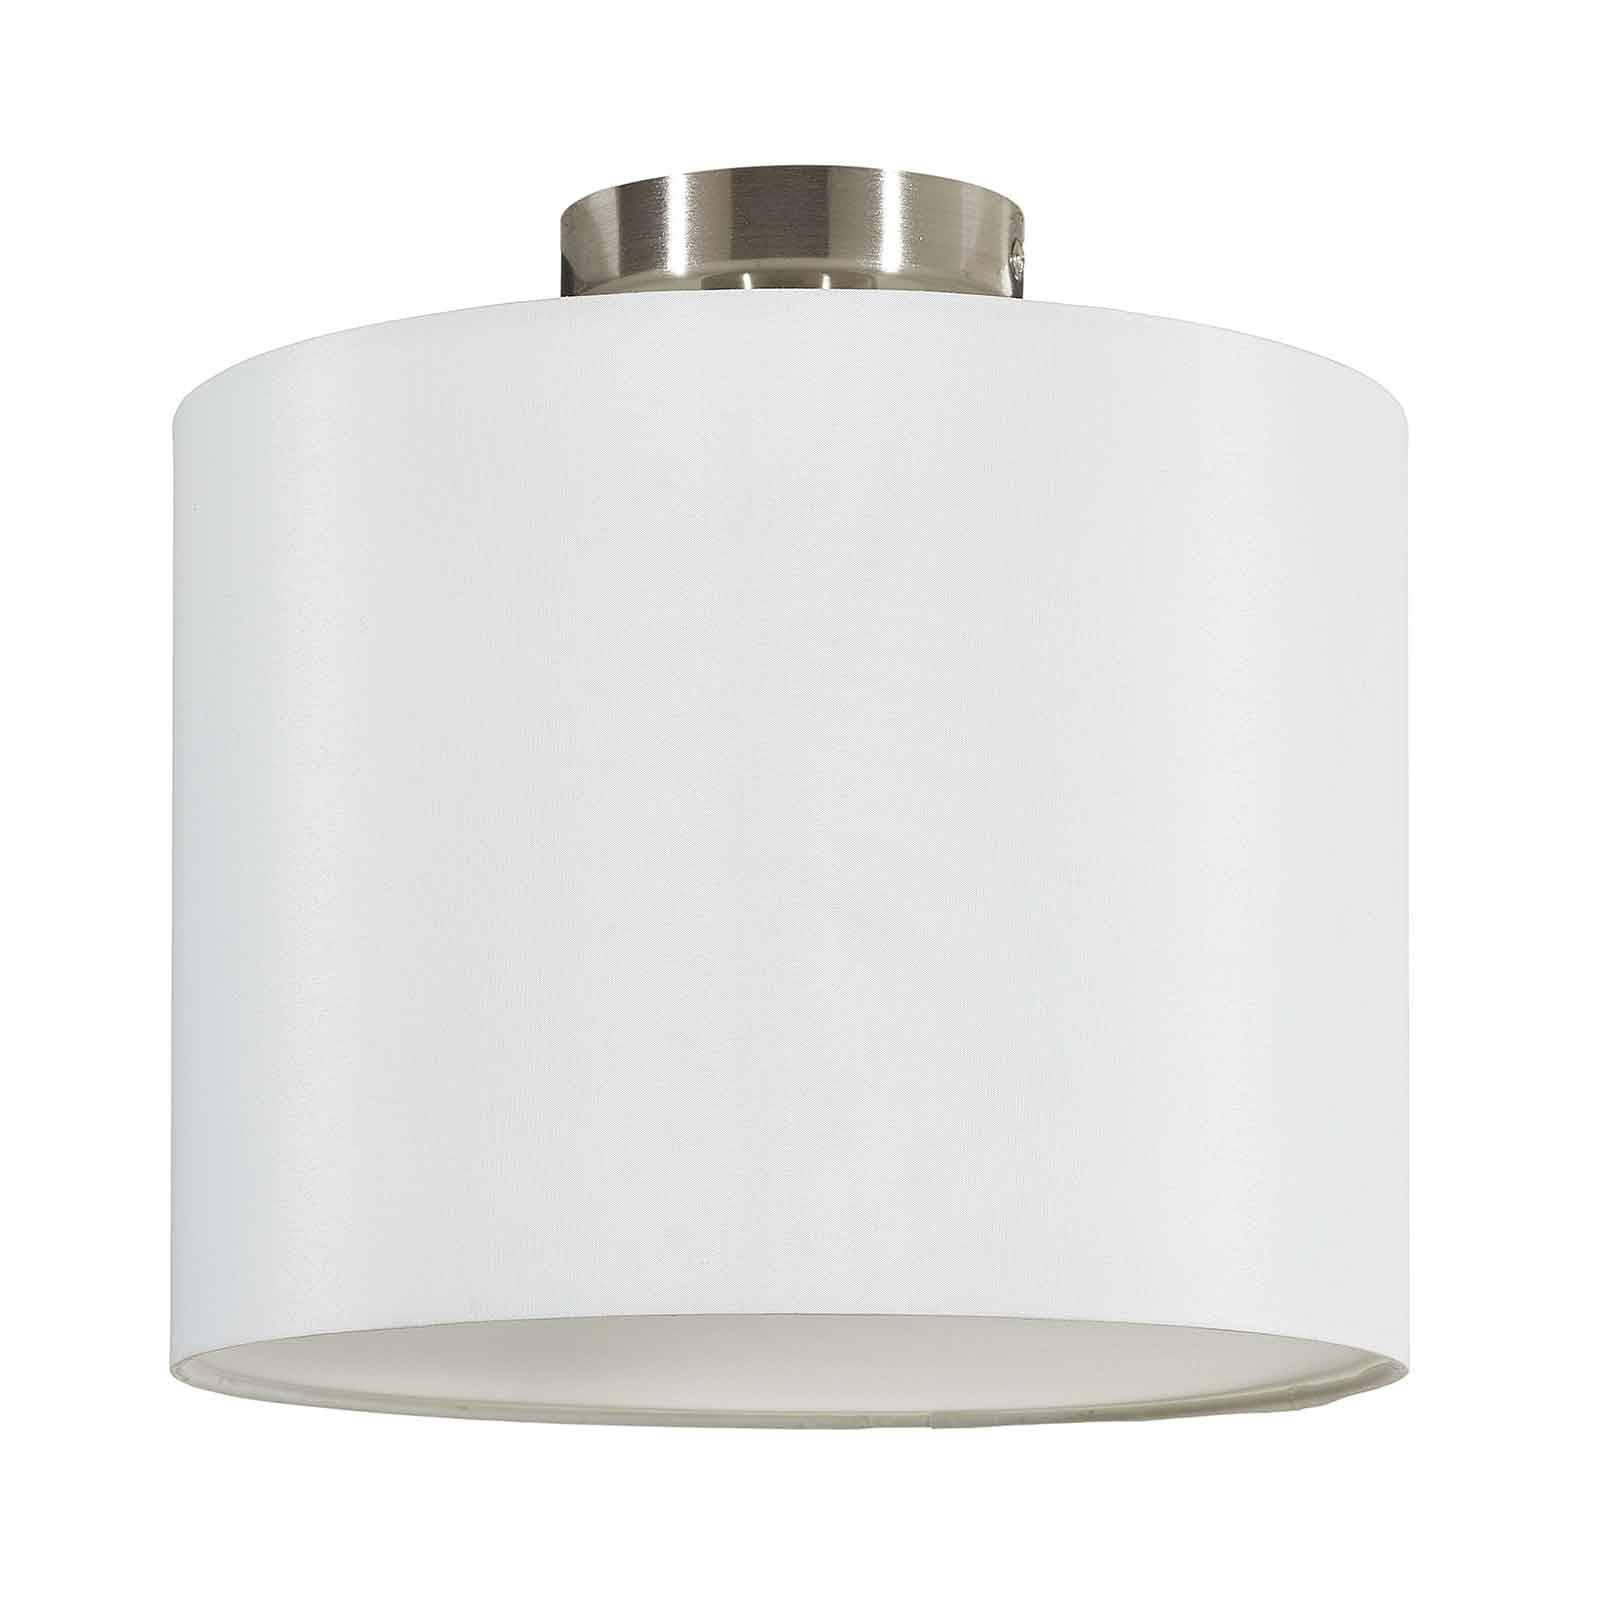 Lucande Patrik textiel-plafondlamp Ø30cm wit